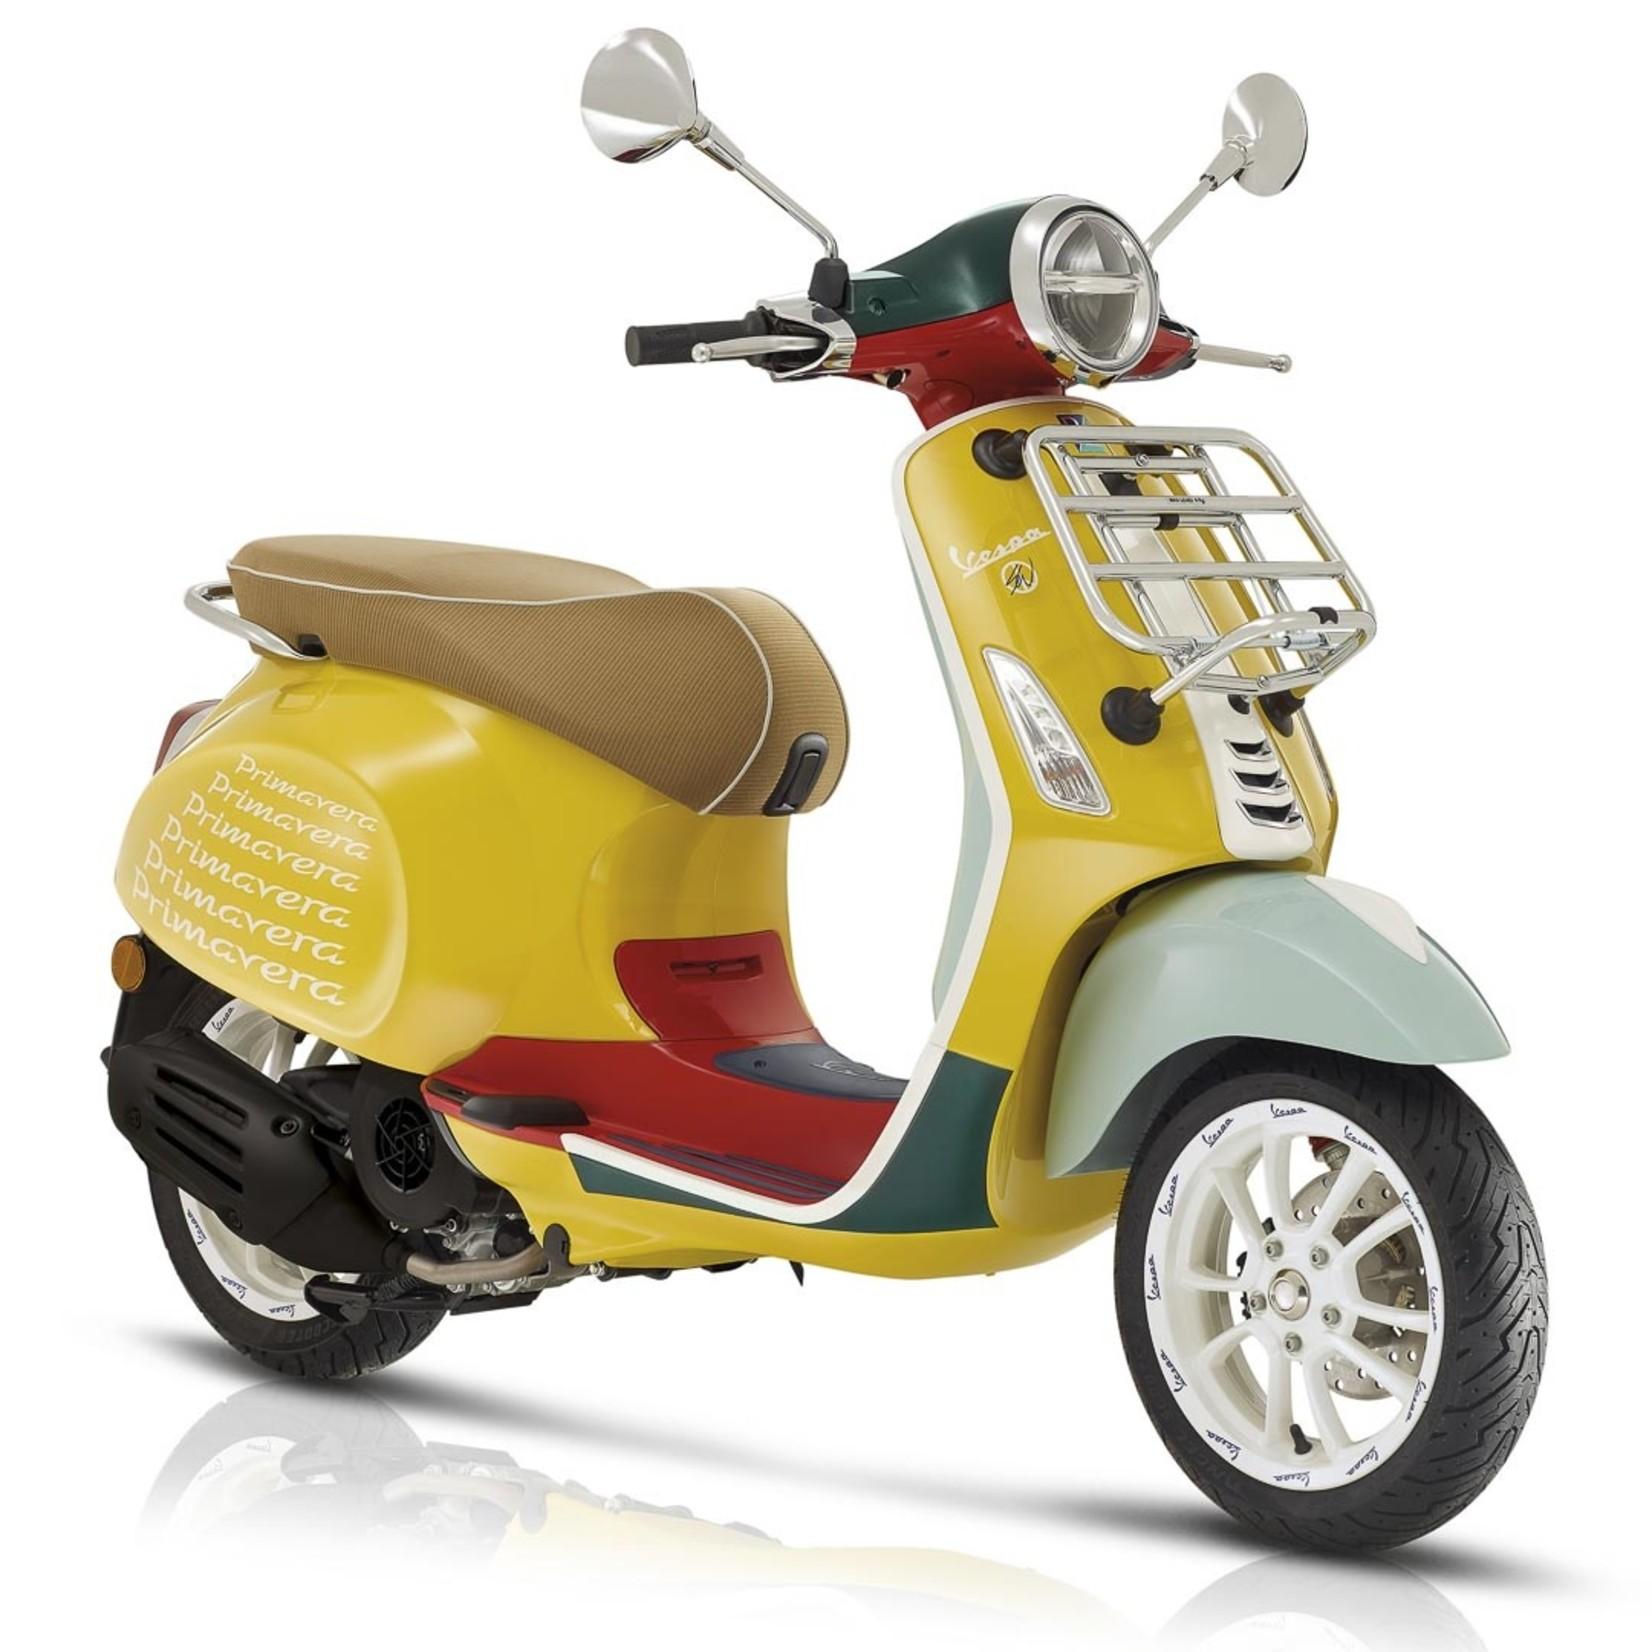 Vehicles 2022 Primavera 150 Sean Wotherspoon Edition